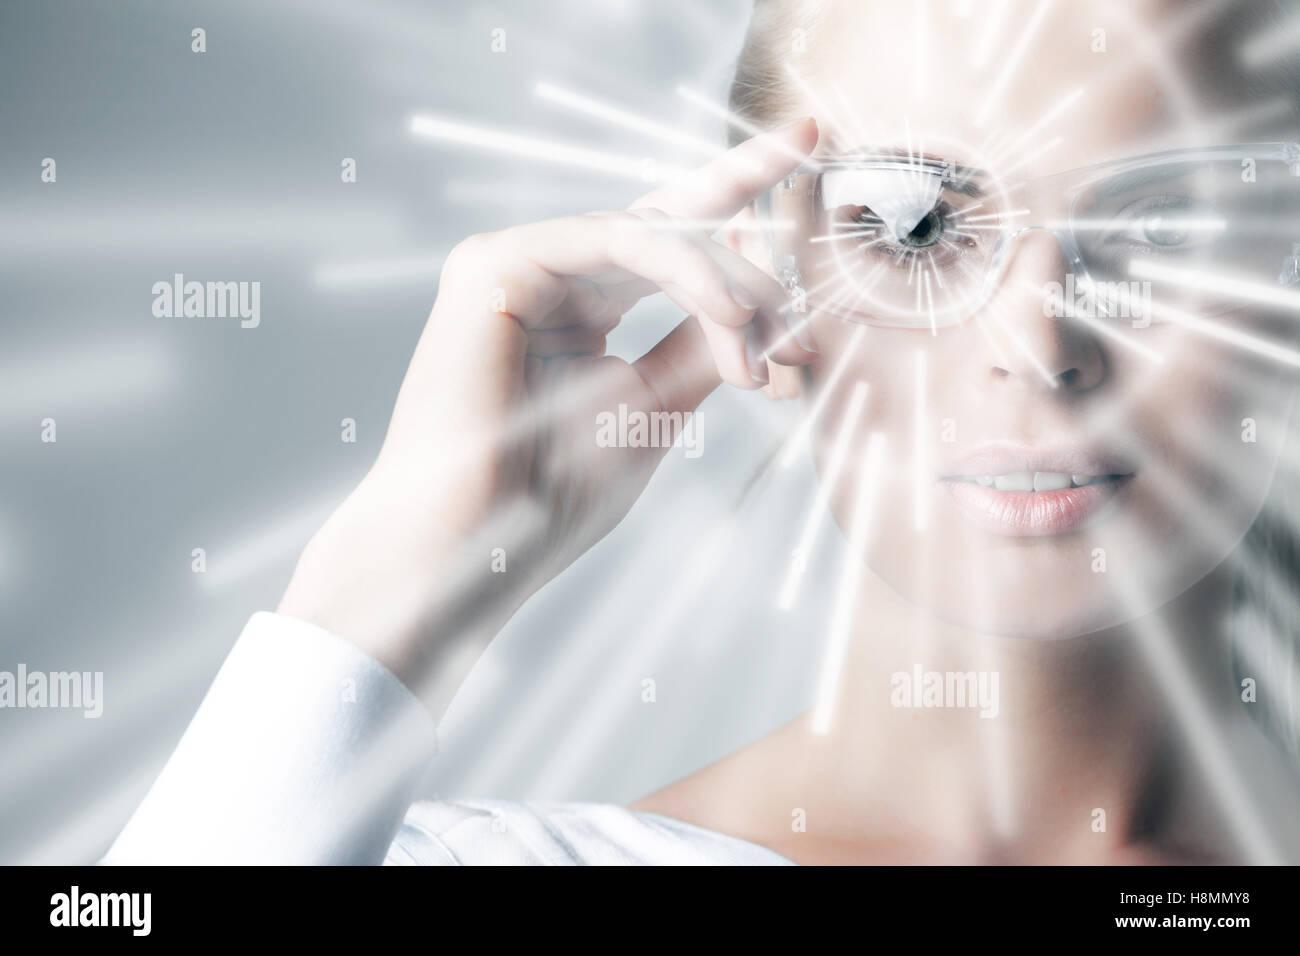 Frau in virtual-Reality-Brille und Hologramm-Strahlen Stockfoto